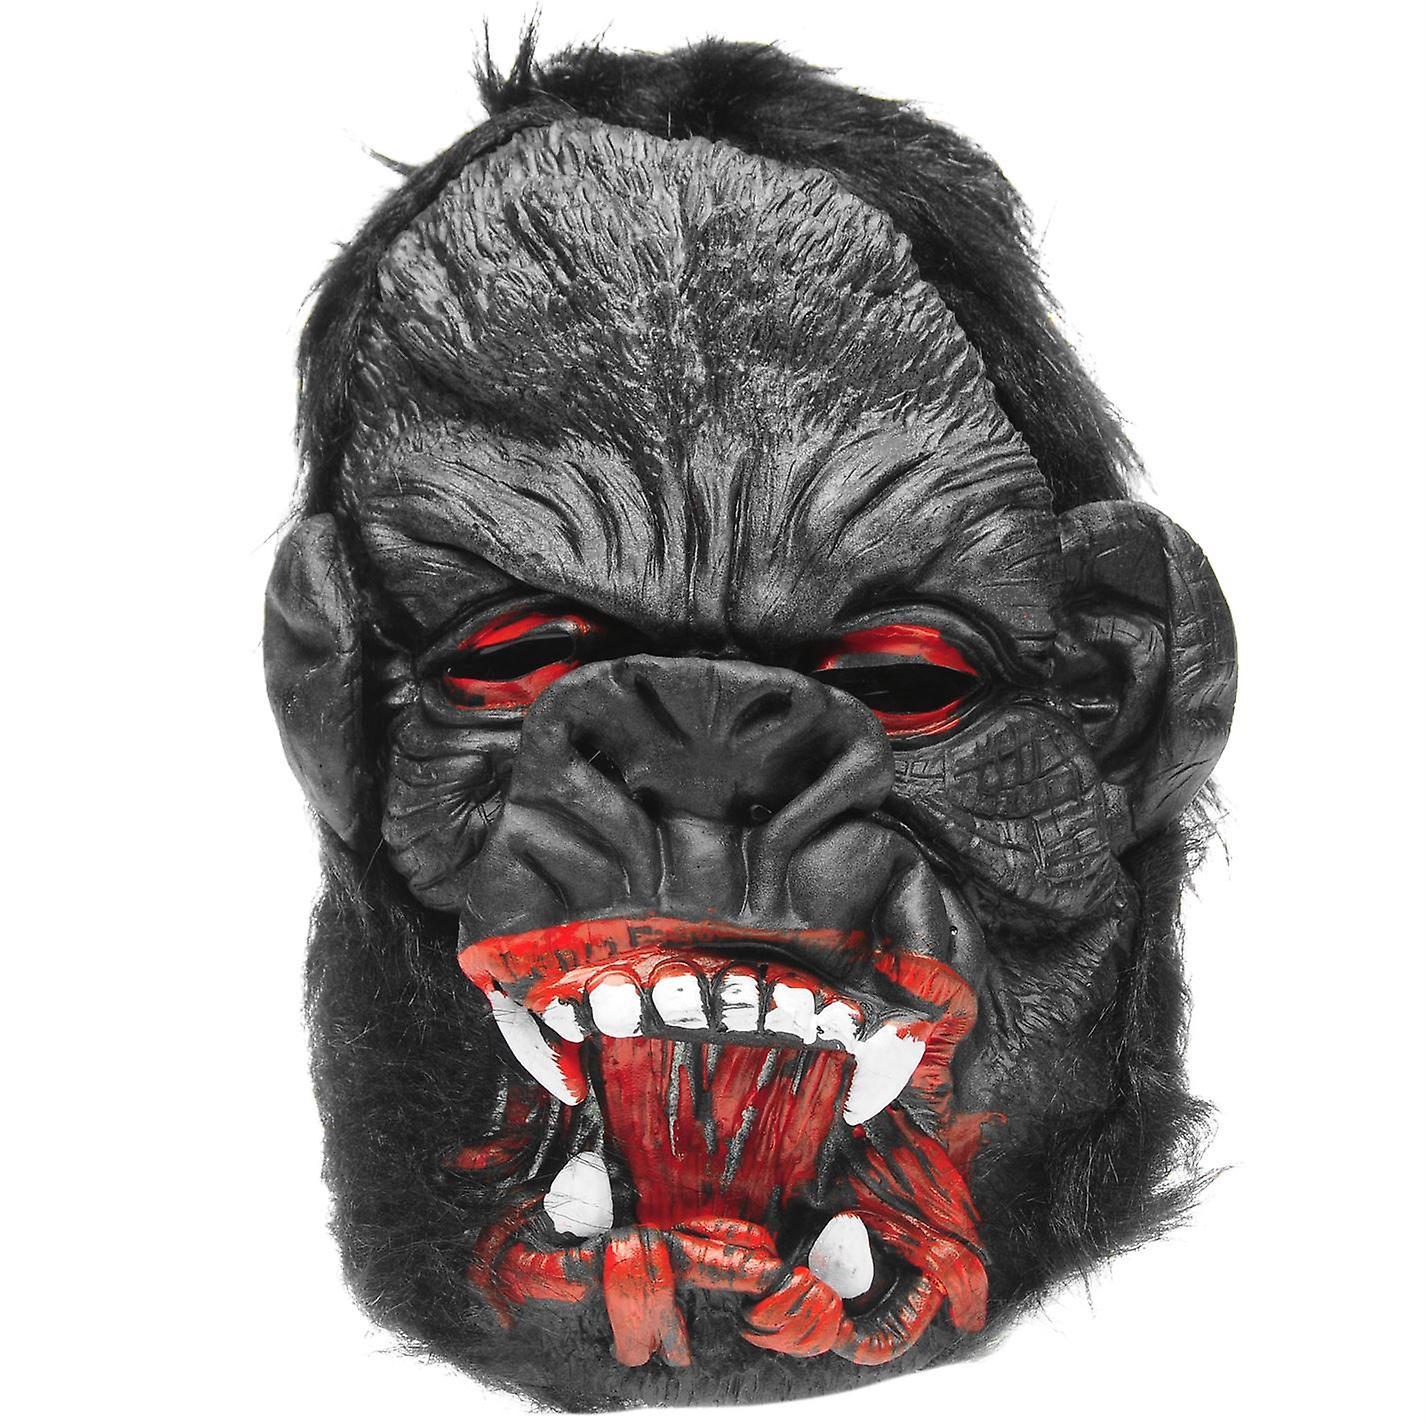 Pulp Unisex Maschera di Halloween